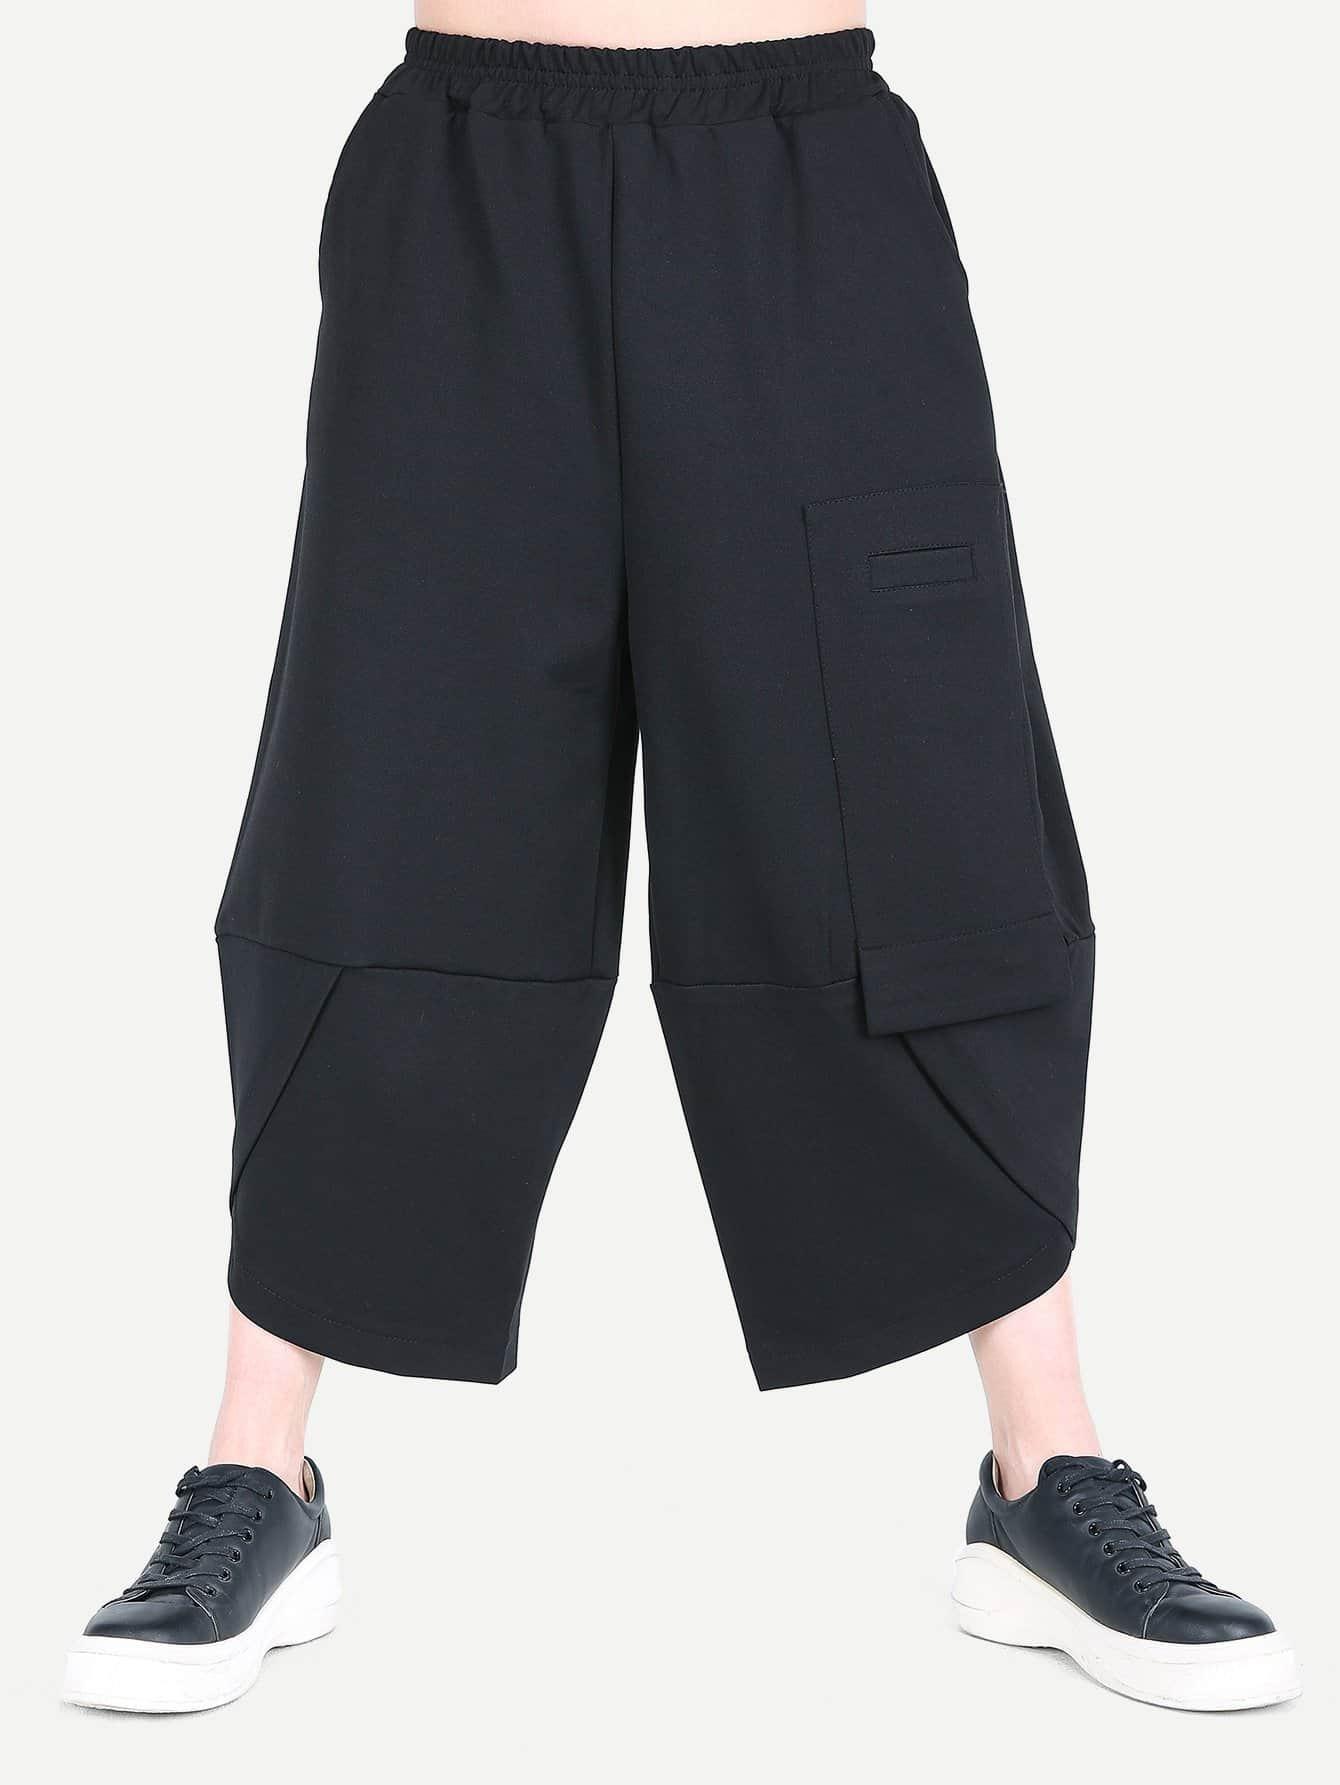 Men Contrast Elastic Waist Wide Leg Pants casual elastic waist printed ninth women s wide leg pants